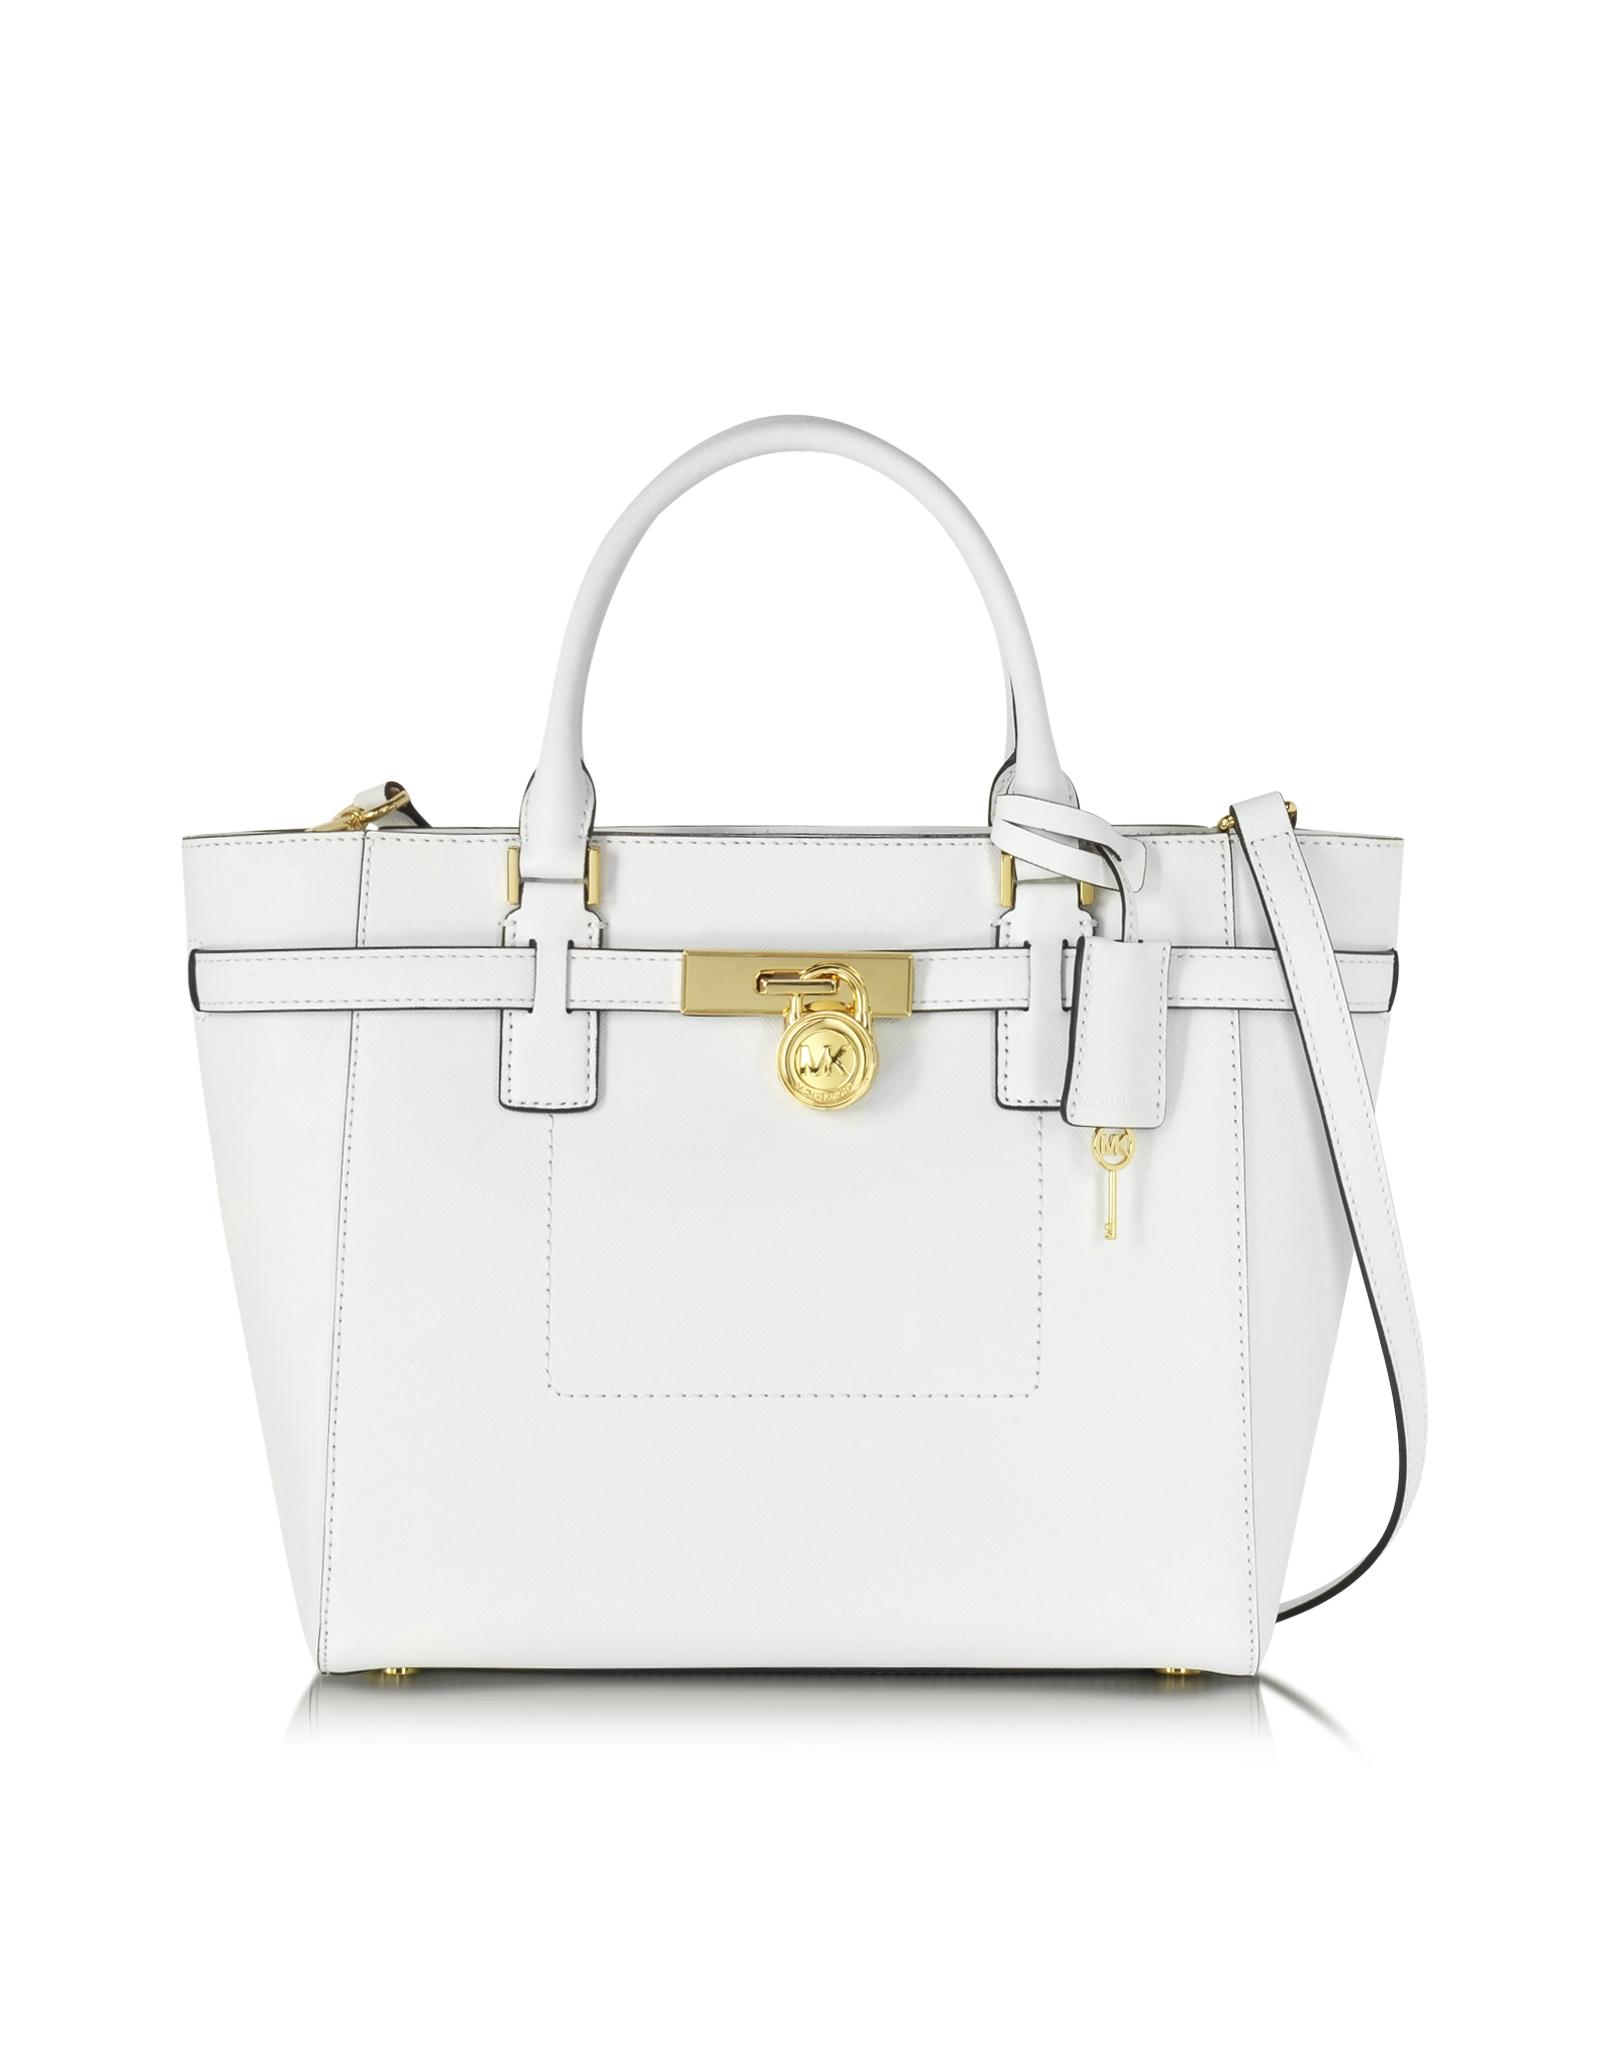 7f947508e06d Lyst - Michael Kors Hamilton Saffiano Leather Large Top Zip Tote Bag ...